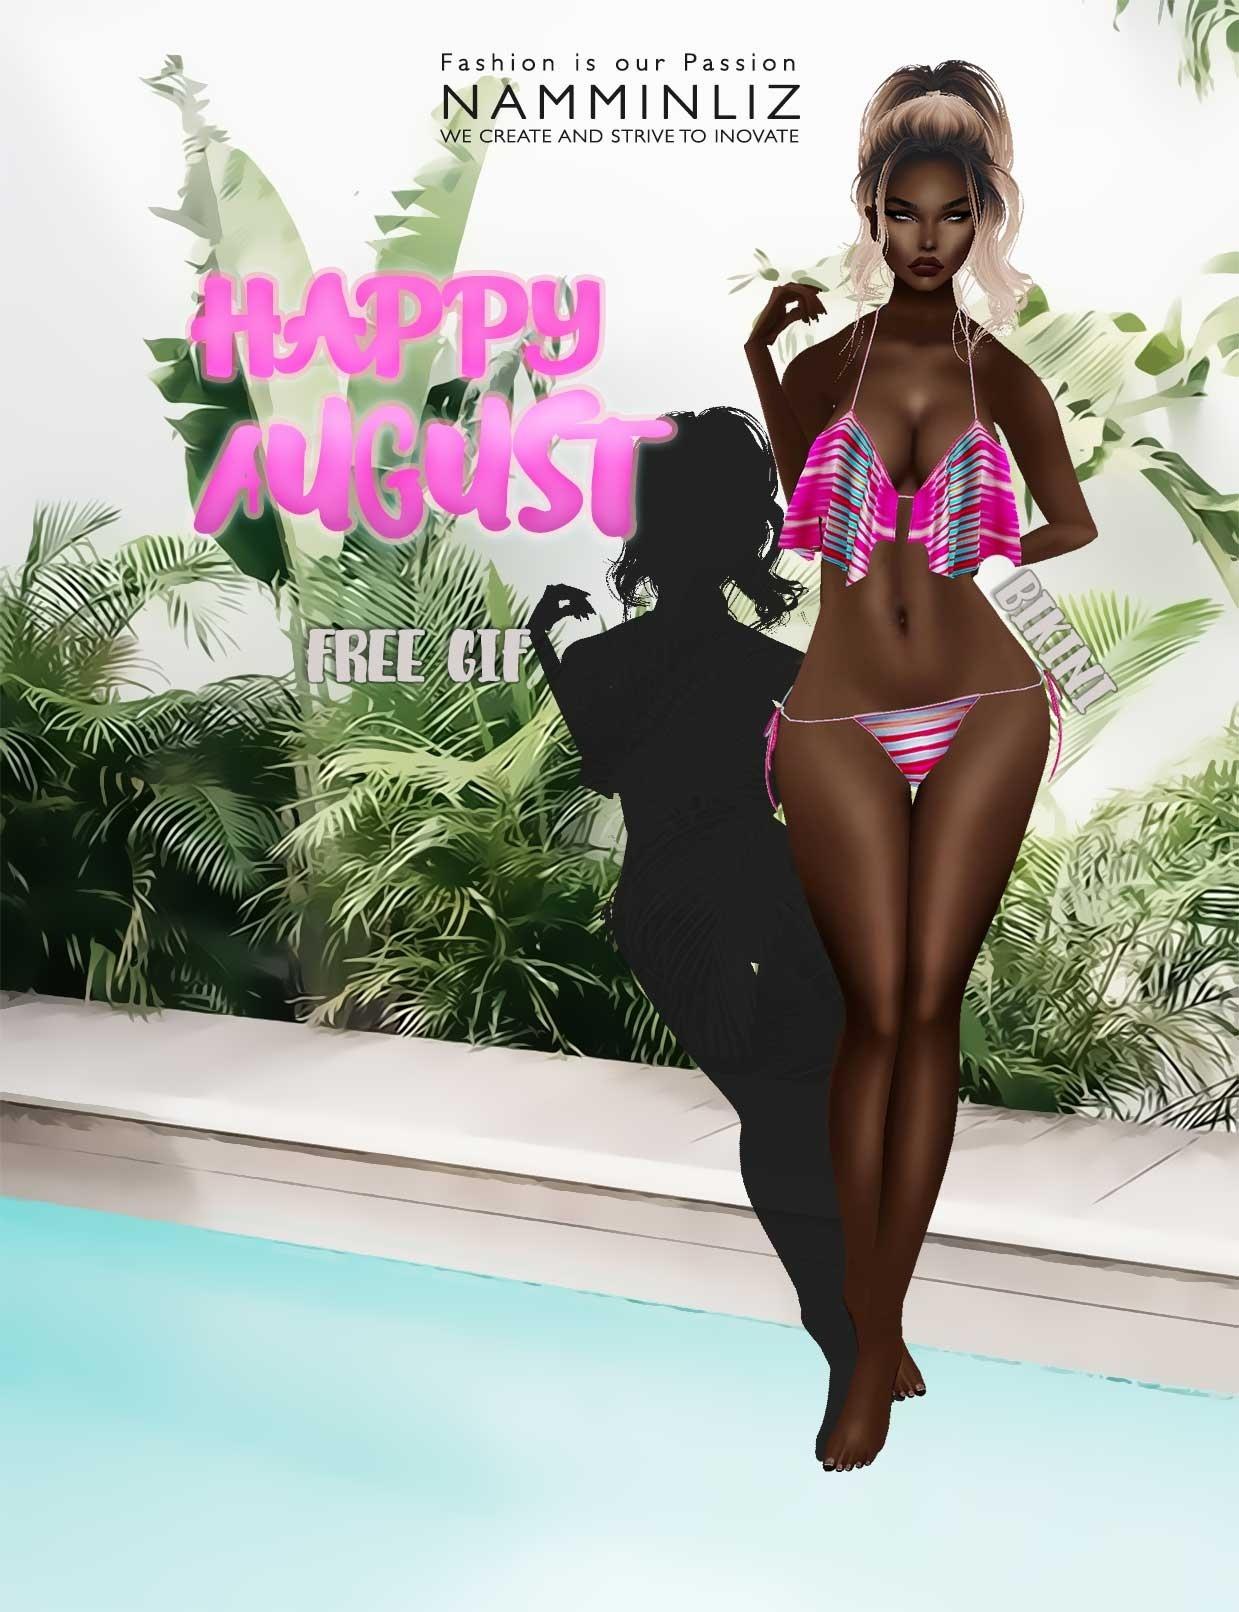 Happy August imvu free gift ♥